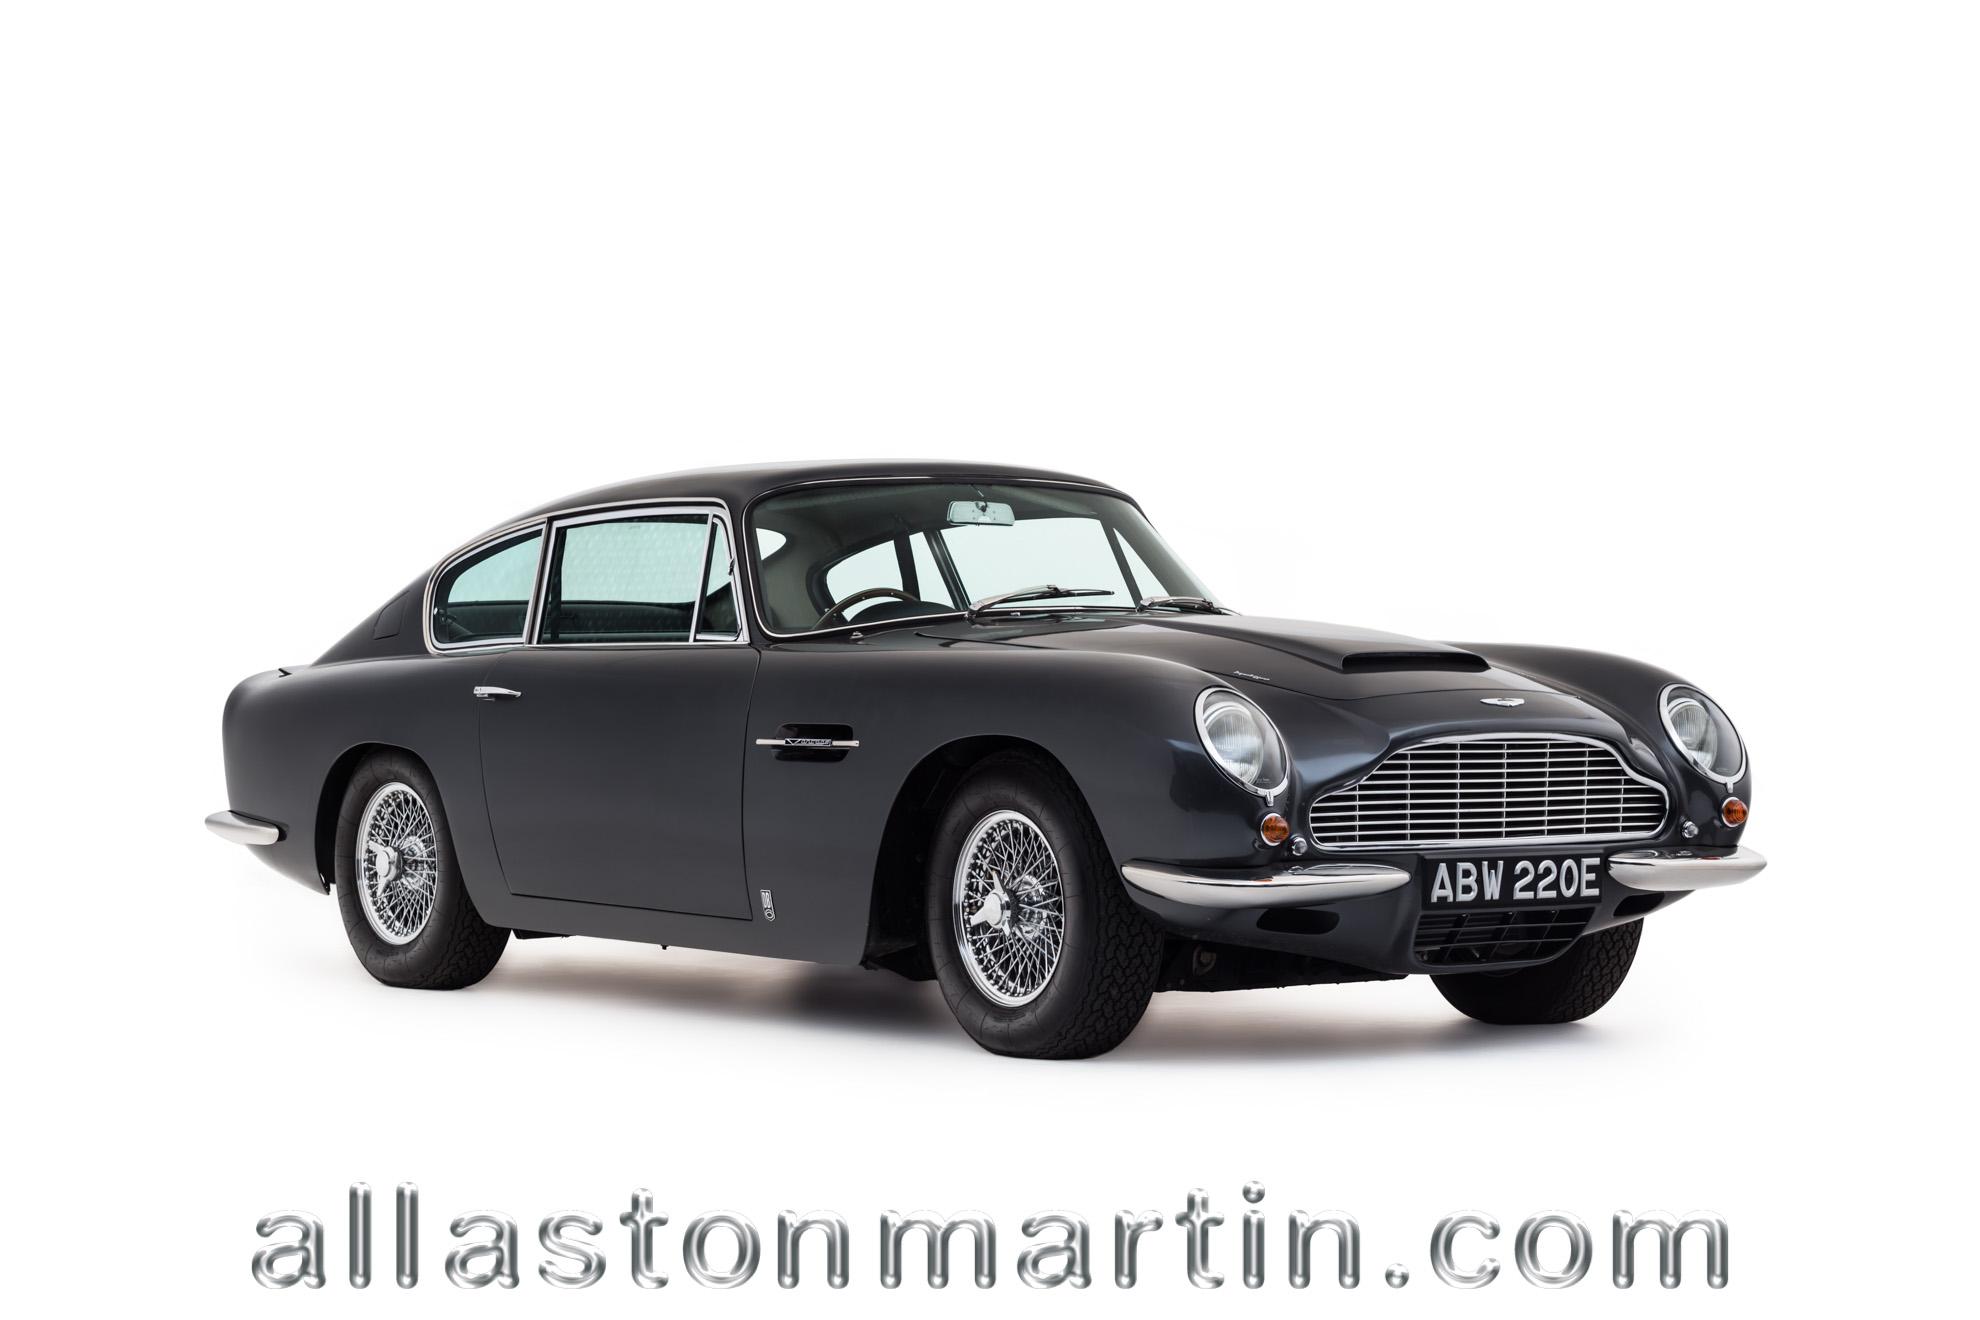 aston martin cars for sale - buy aston martin - details - all aston